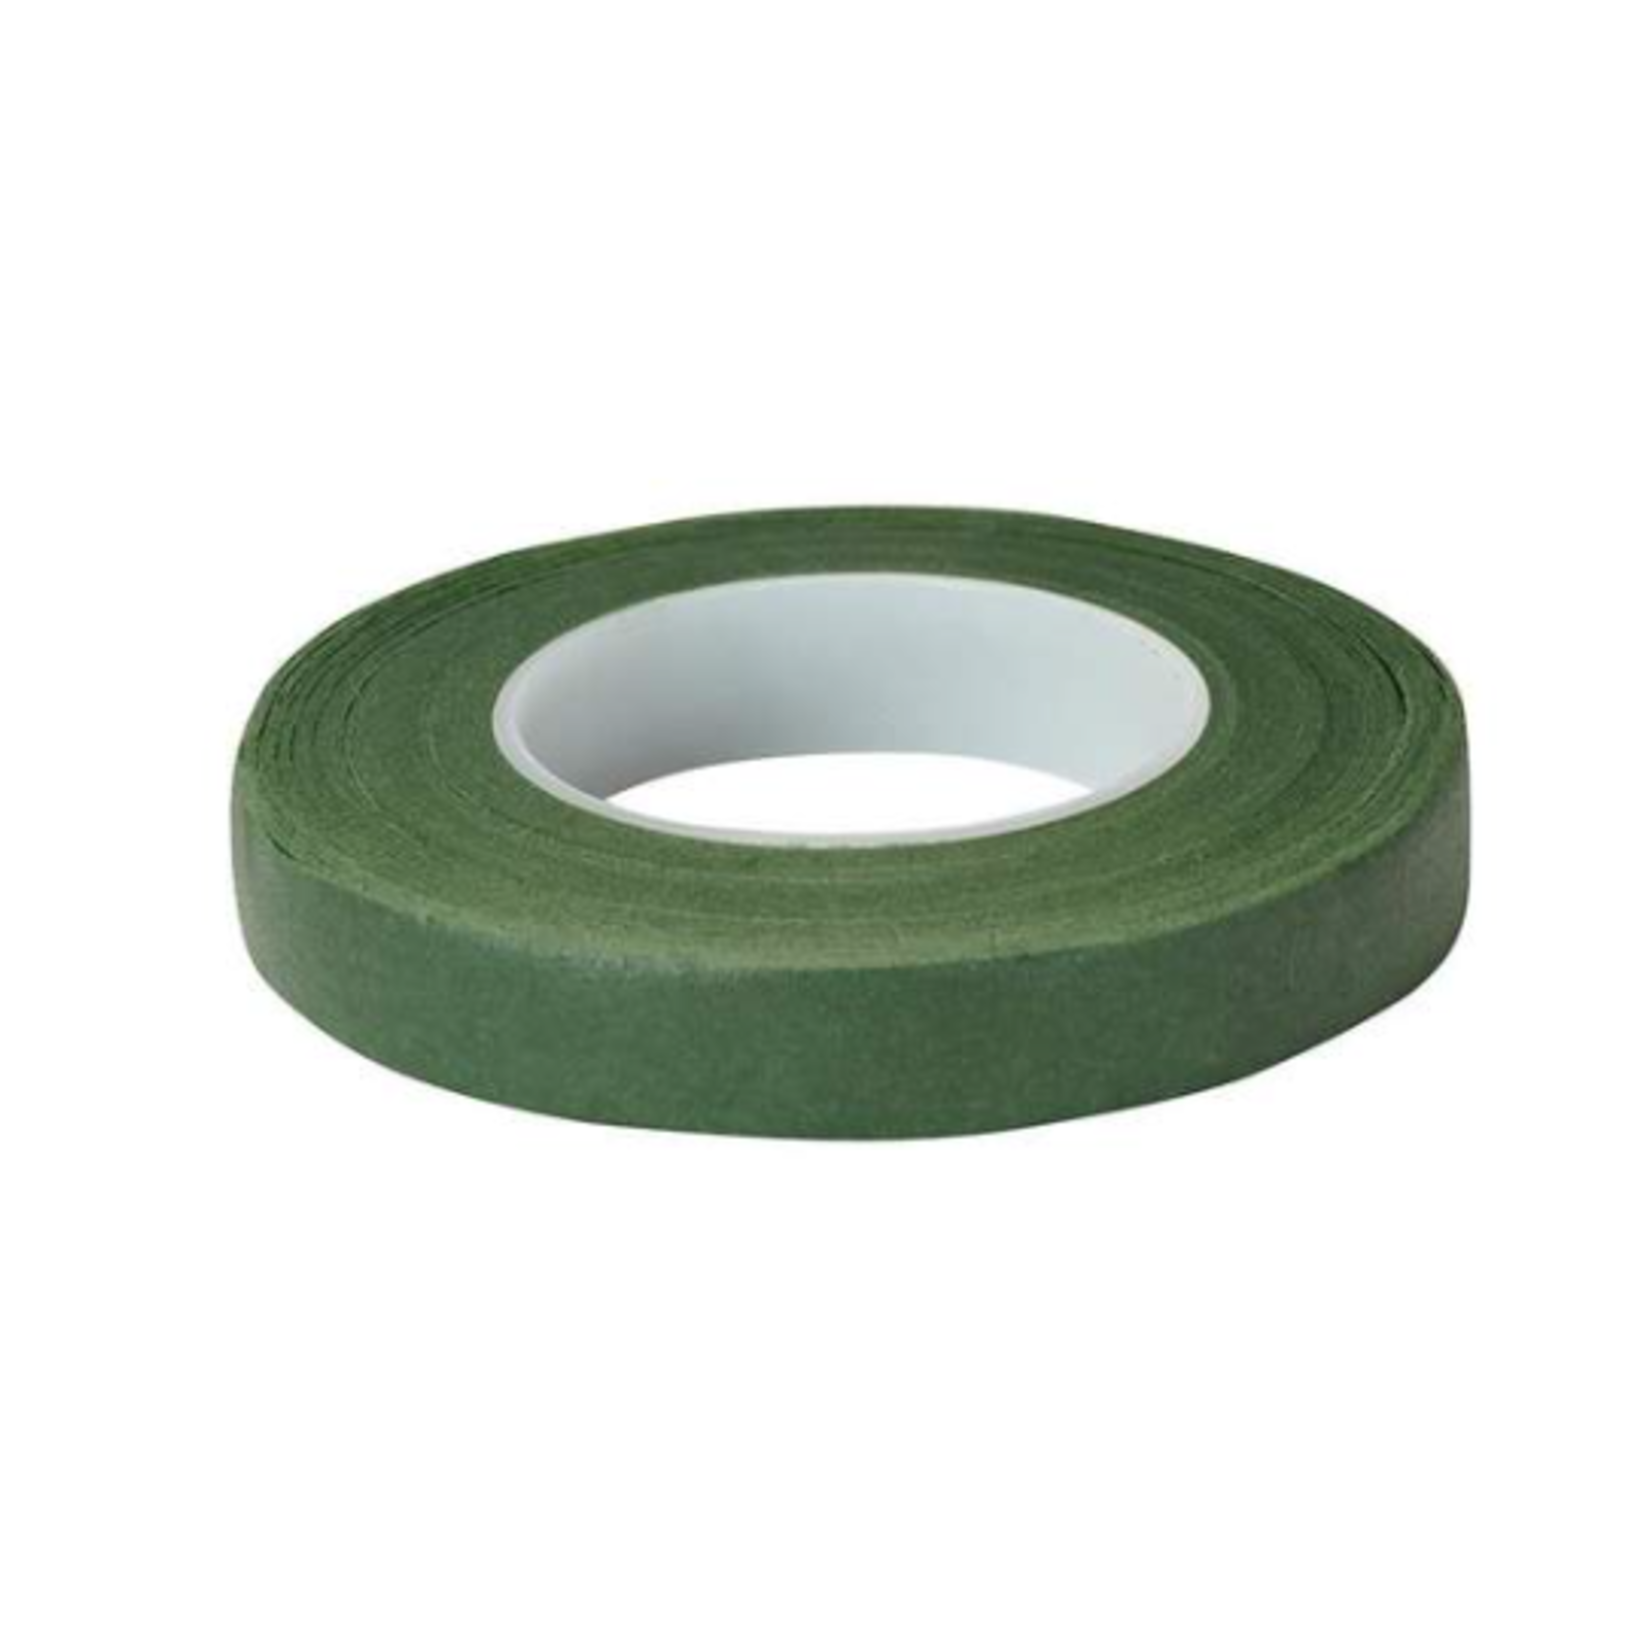 1/2'' GREEN STEM WRAP(12) Dark Green FLORAL TAPE/STEM WRAP